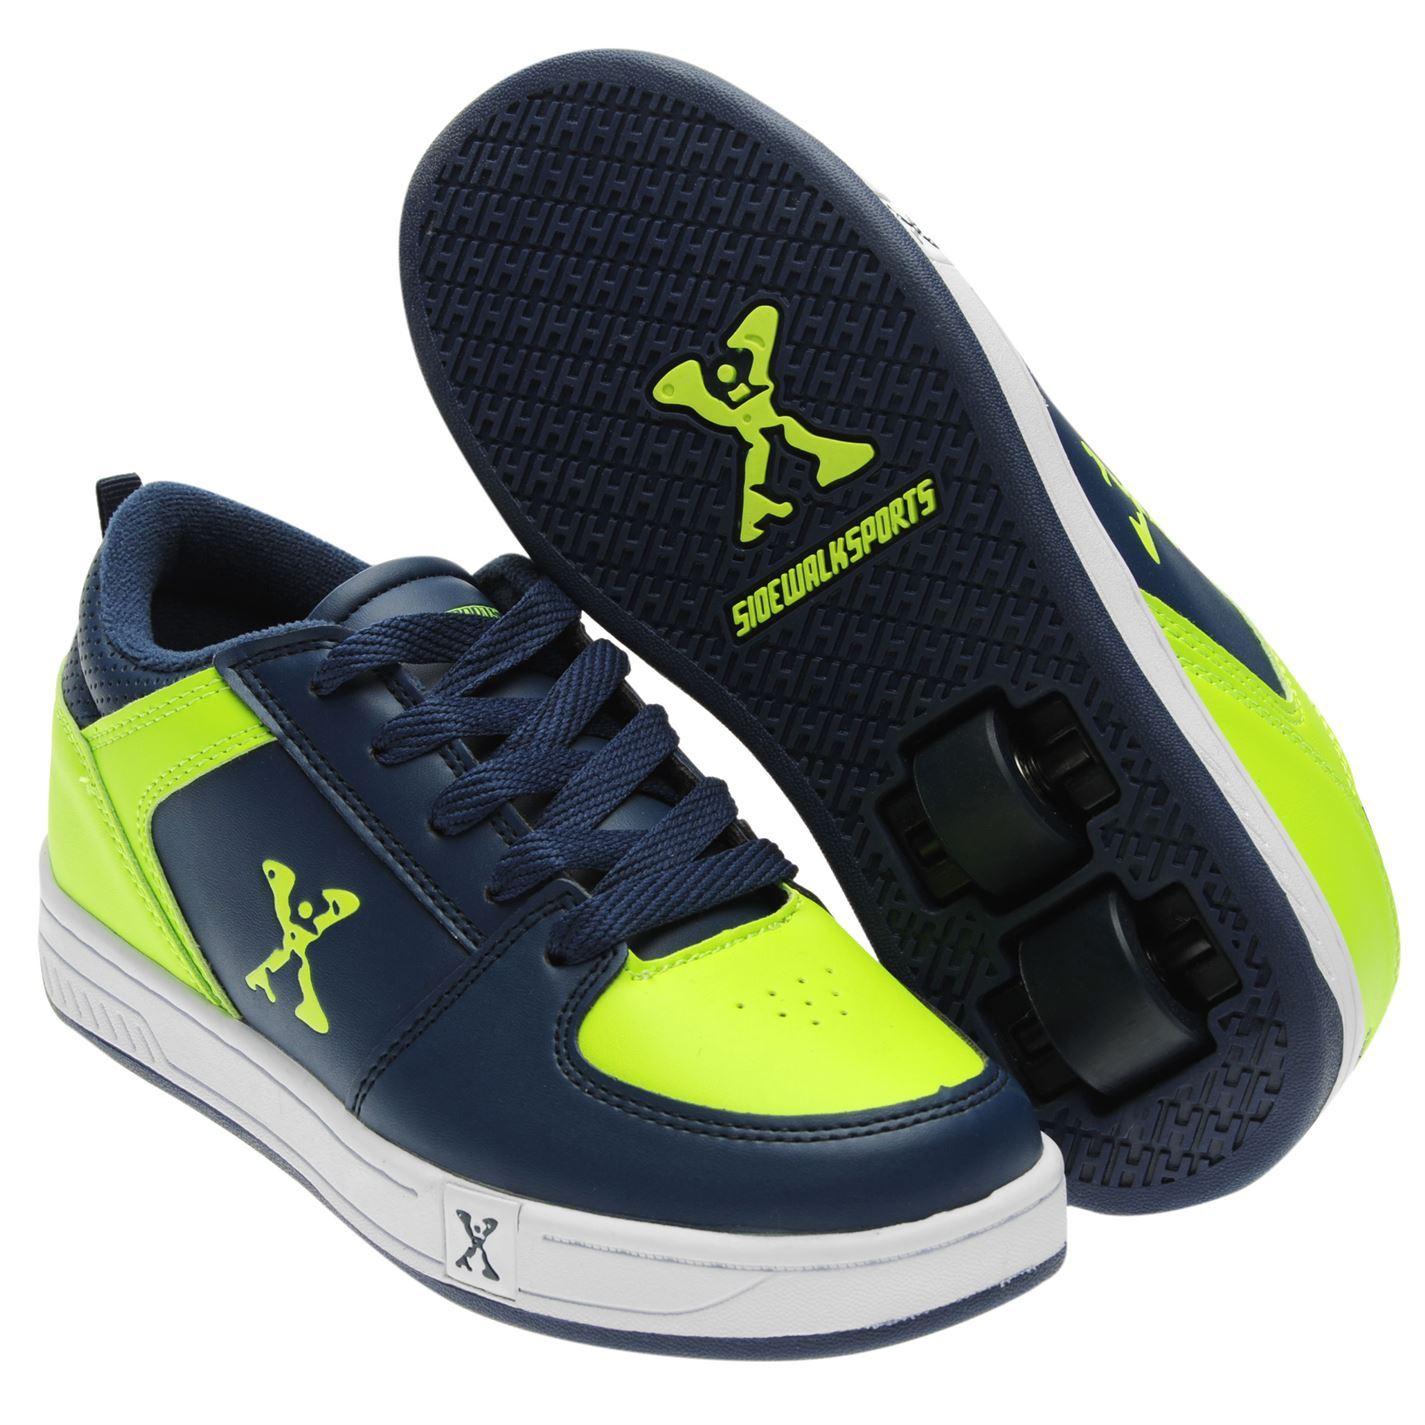 Buy roller shoes online australia - Sidewalk Sport Kids Street Boys Lace Up Skate